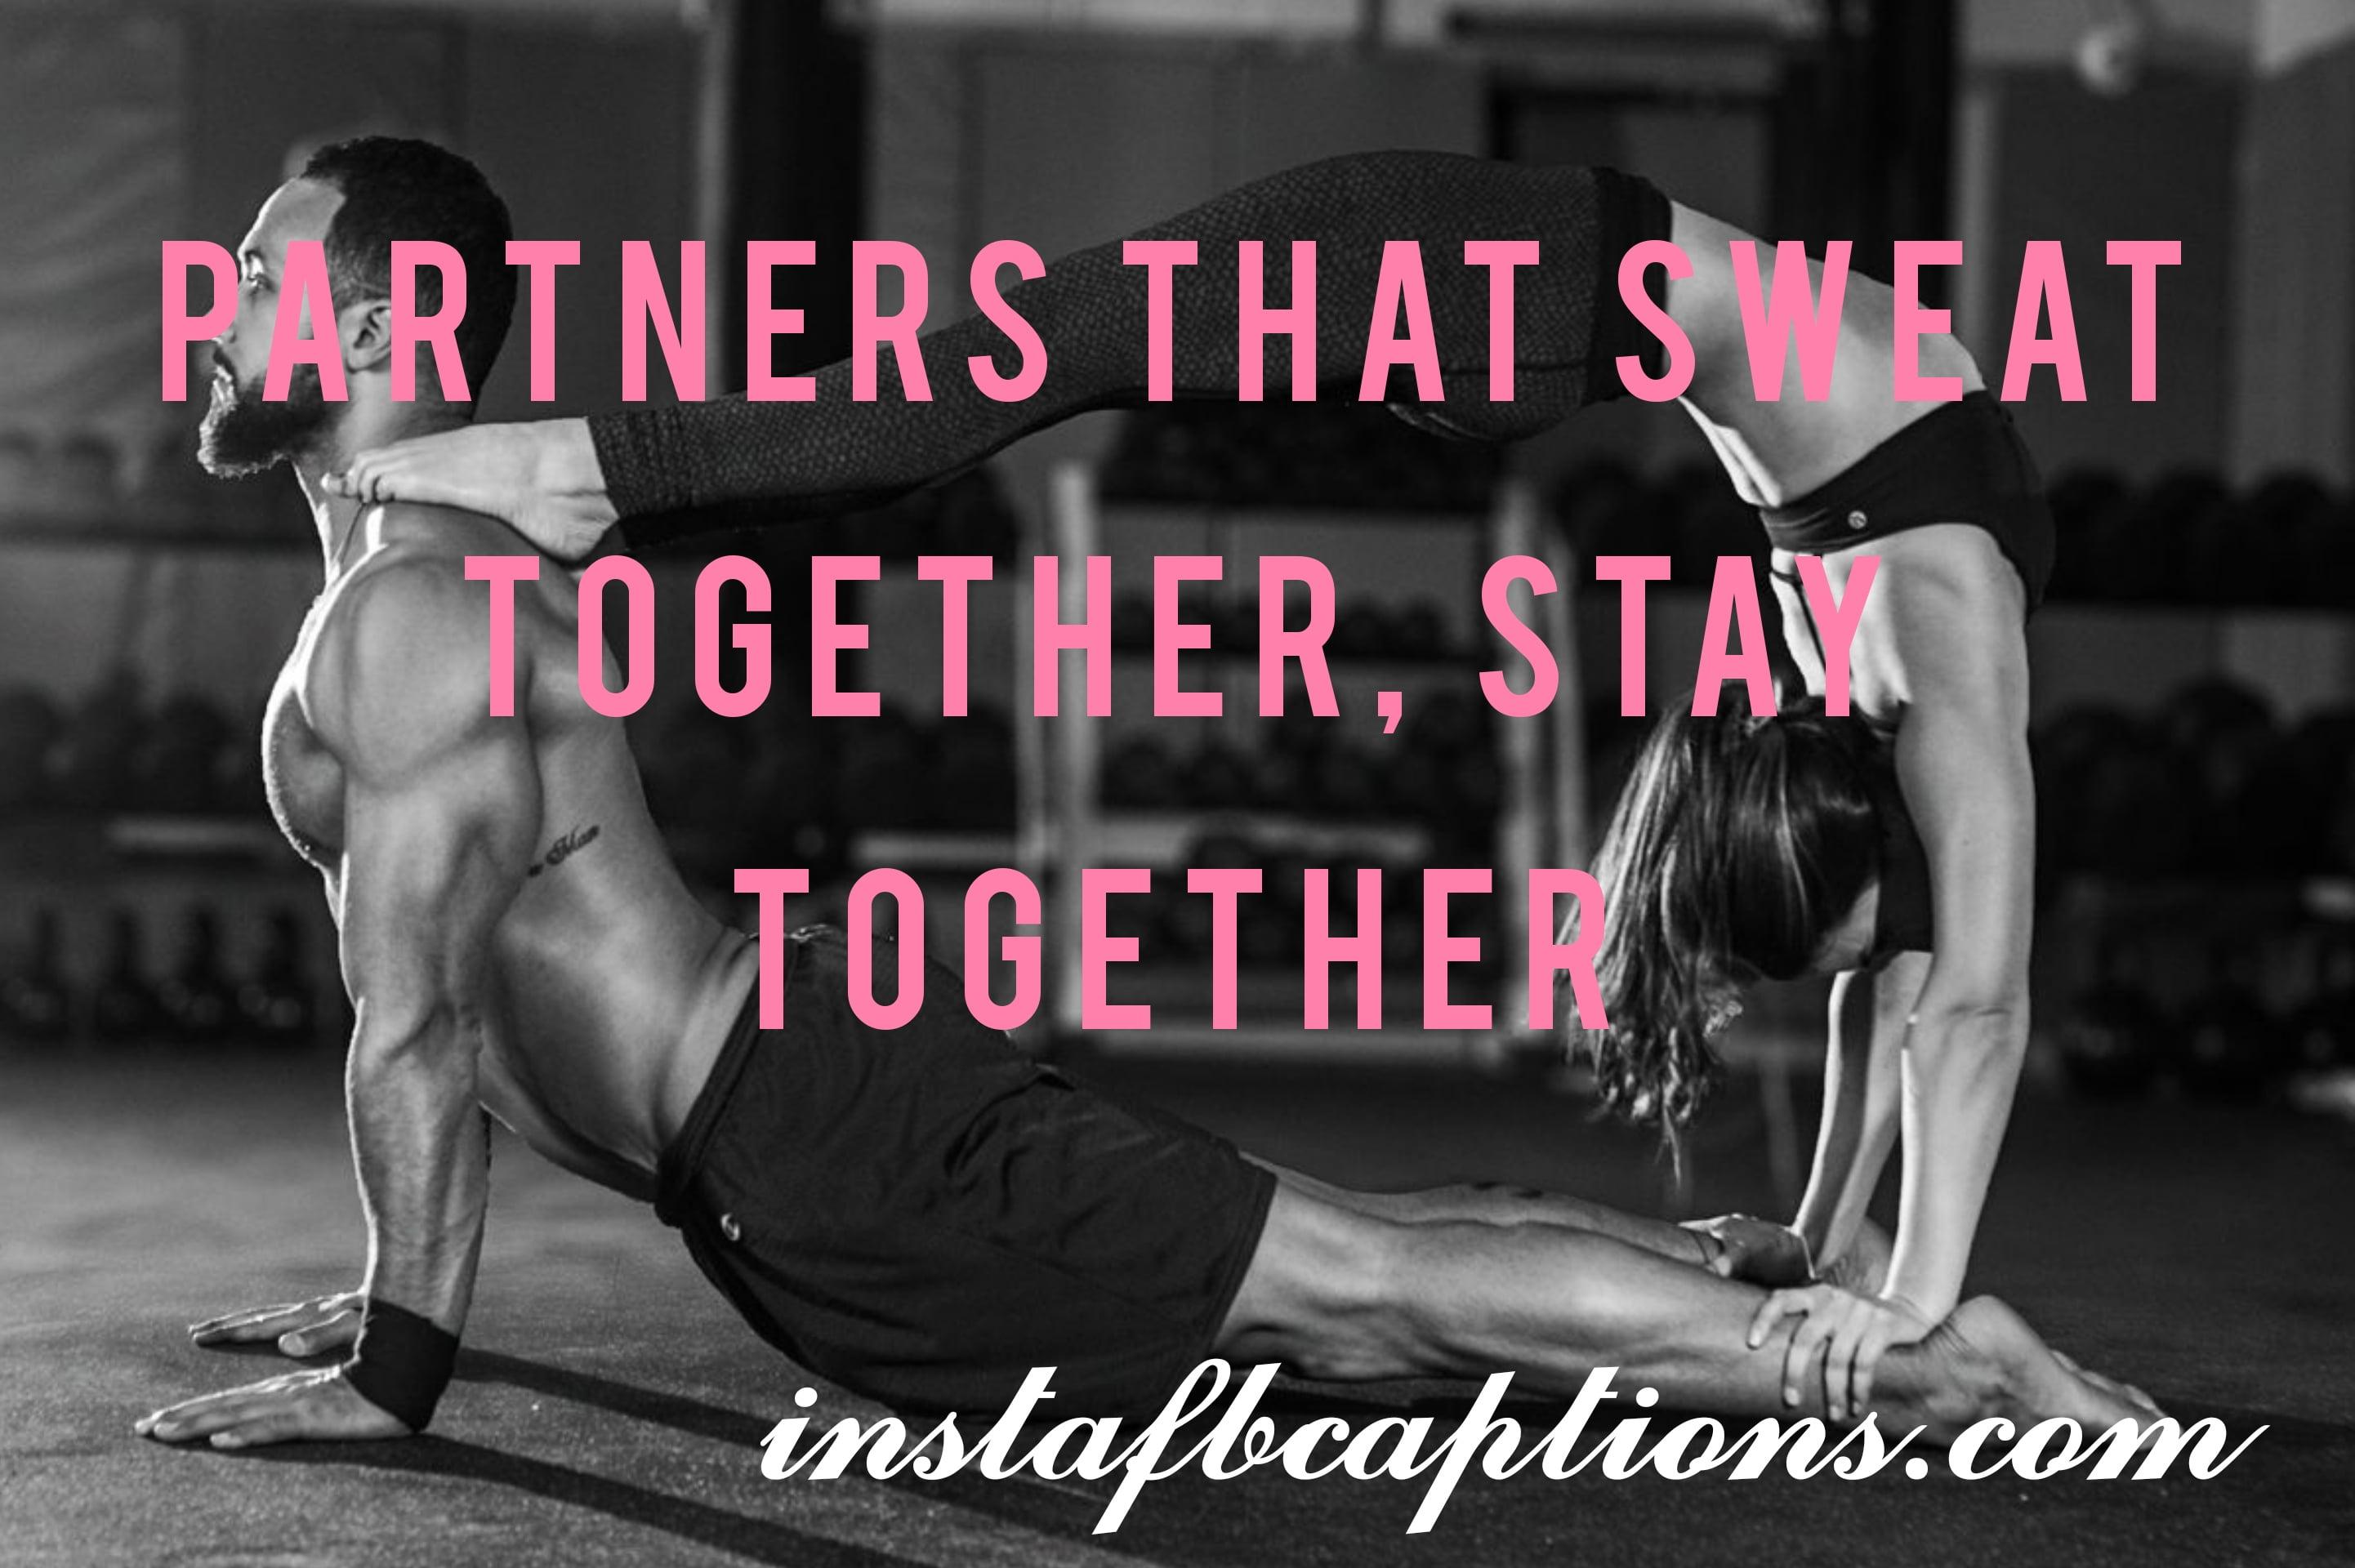 Couple Fitness Goal Captions  - Couple Fitness Goal Captions - 110+ GYM & WORKOUT Instagram Captions 2021